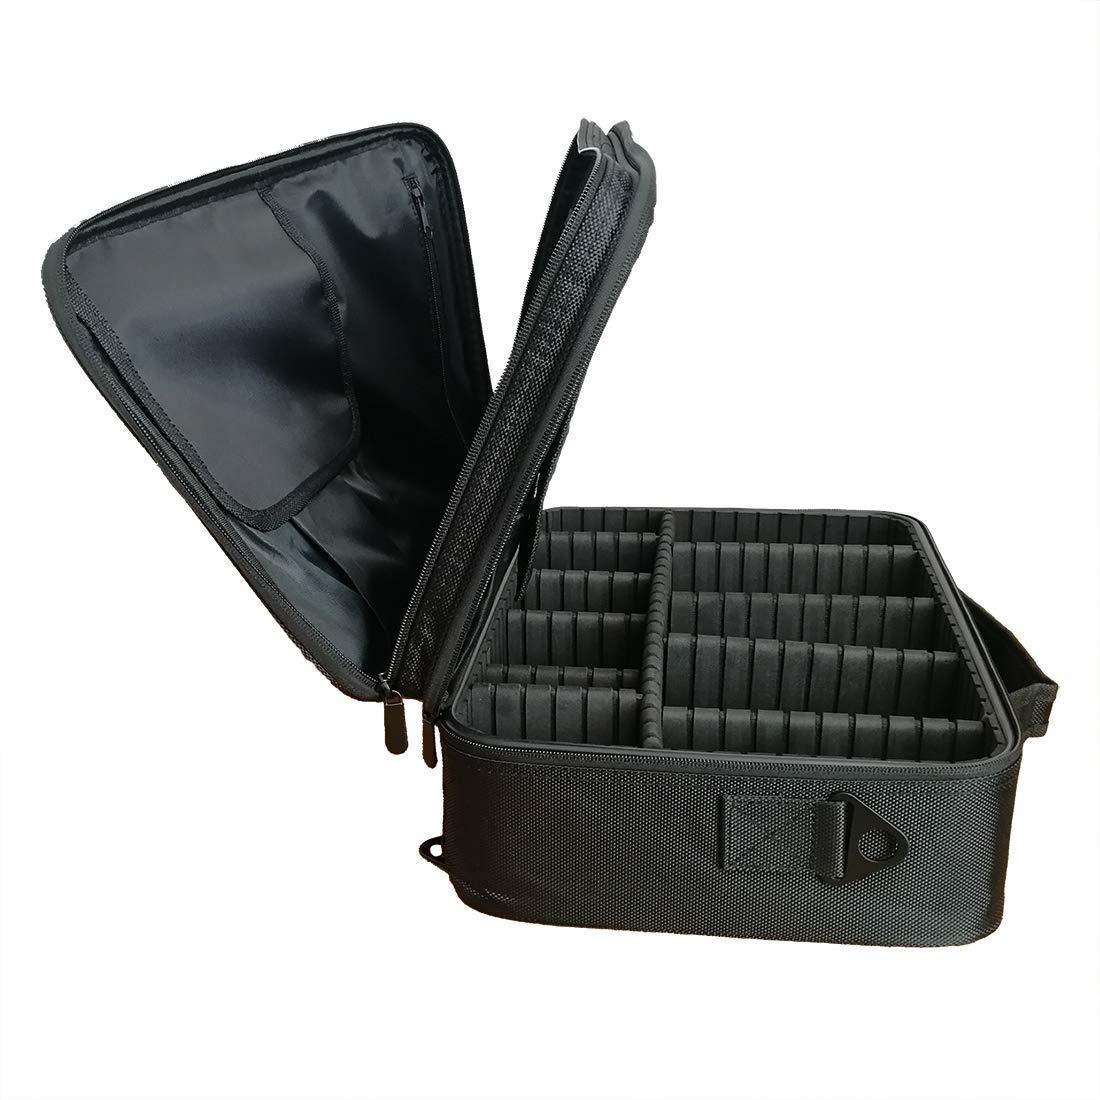 YiYa Large Travel Makeup Bag Professional Cosmetic Train Case Makeup Box Organizer Black